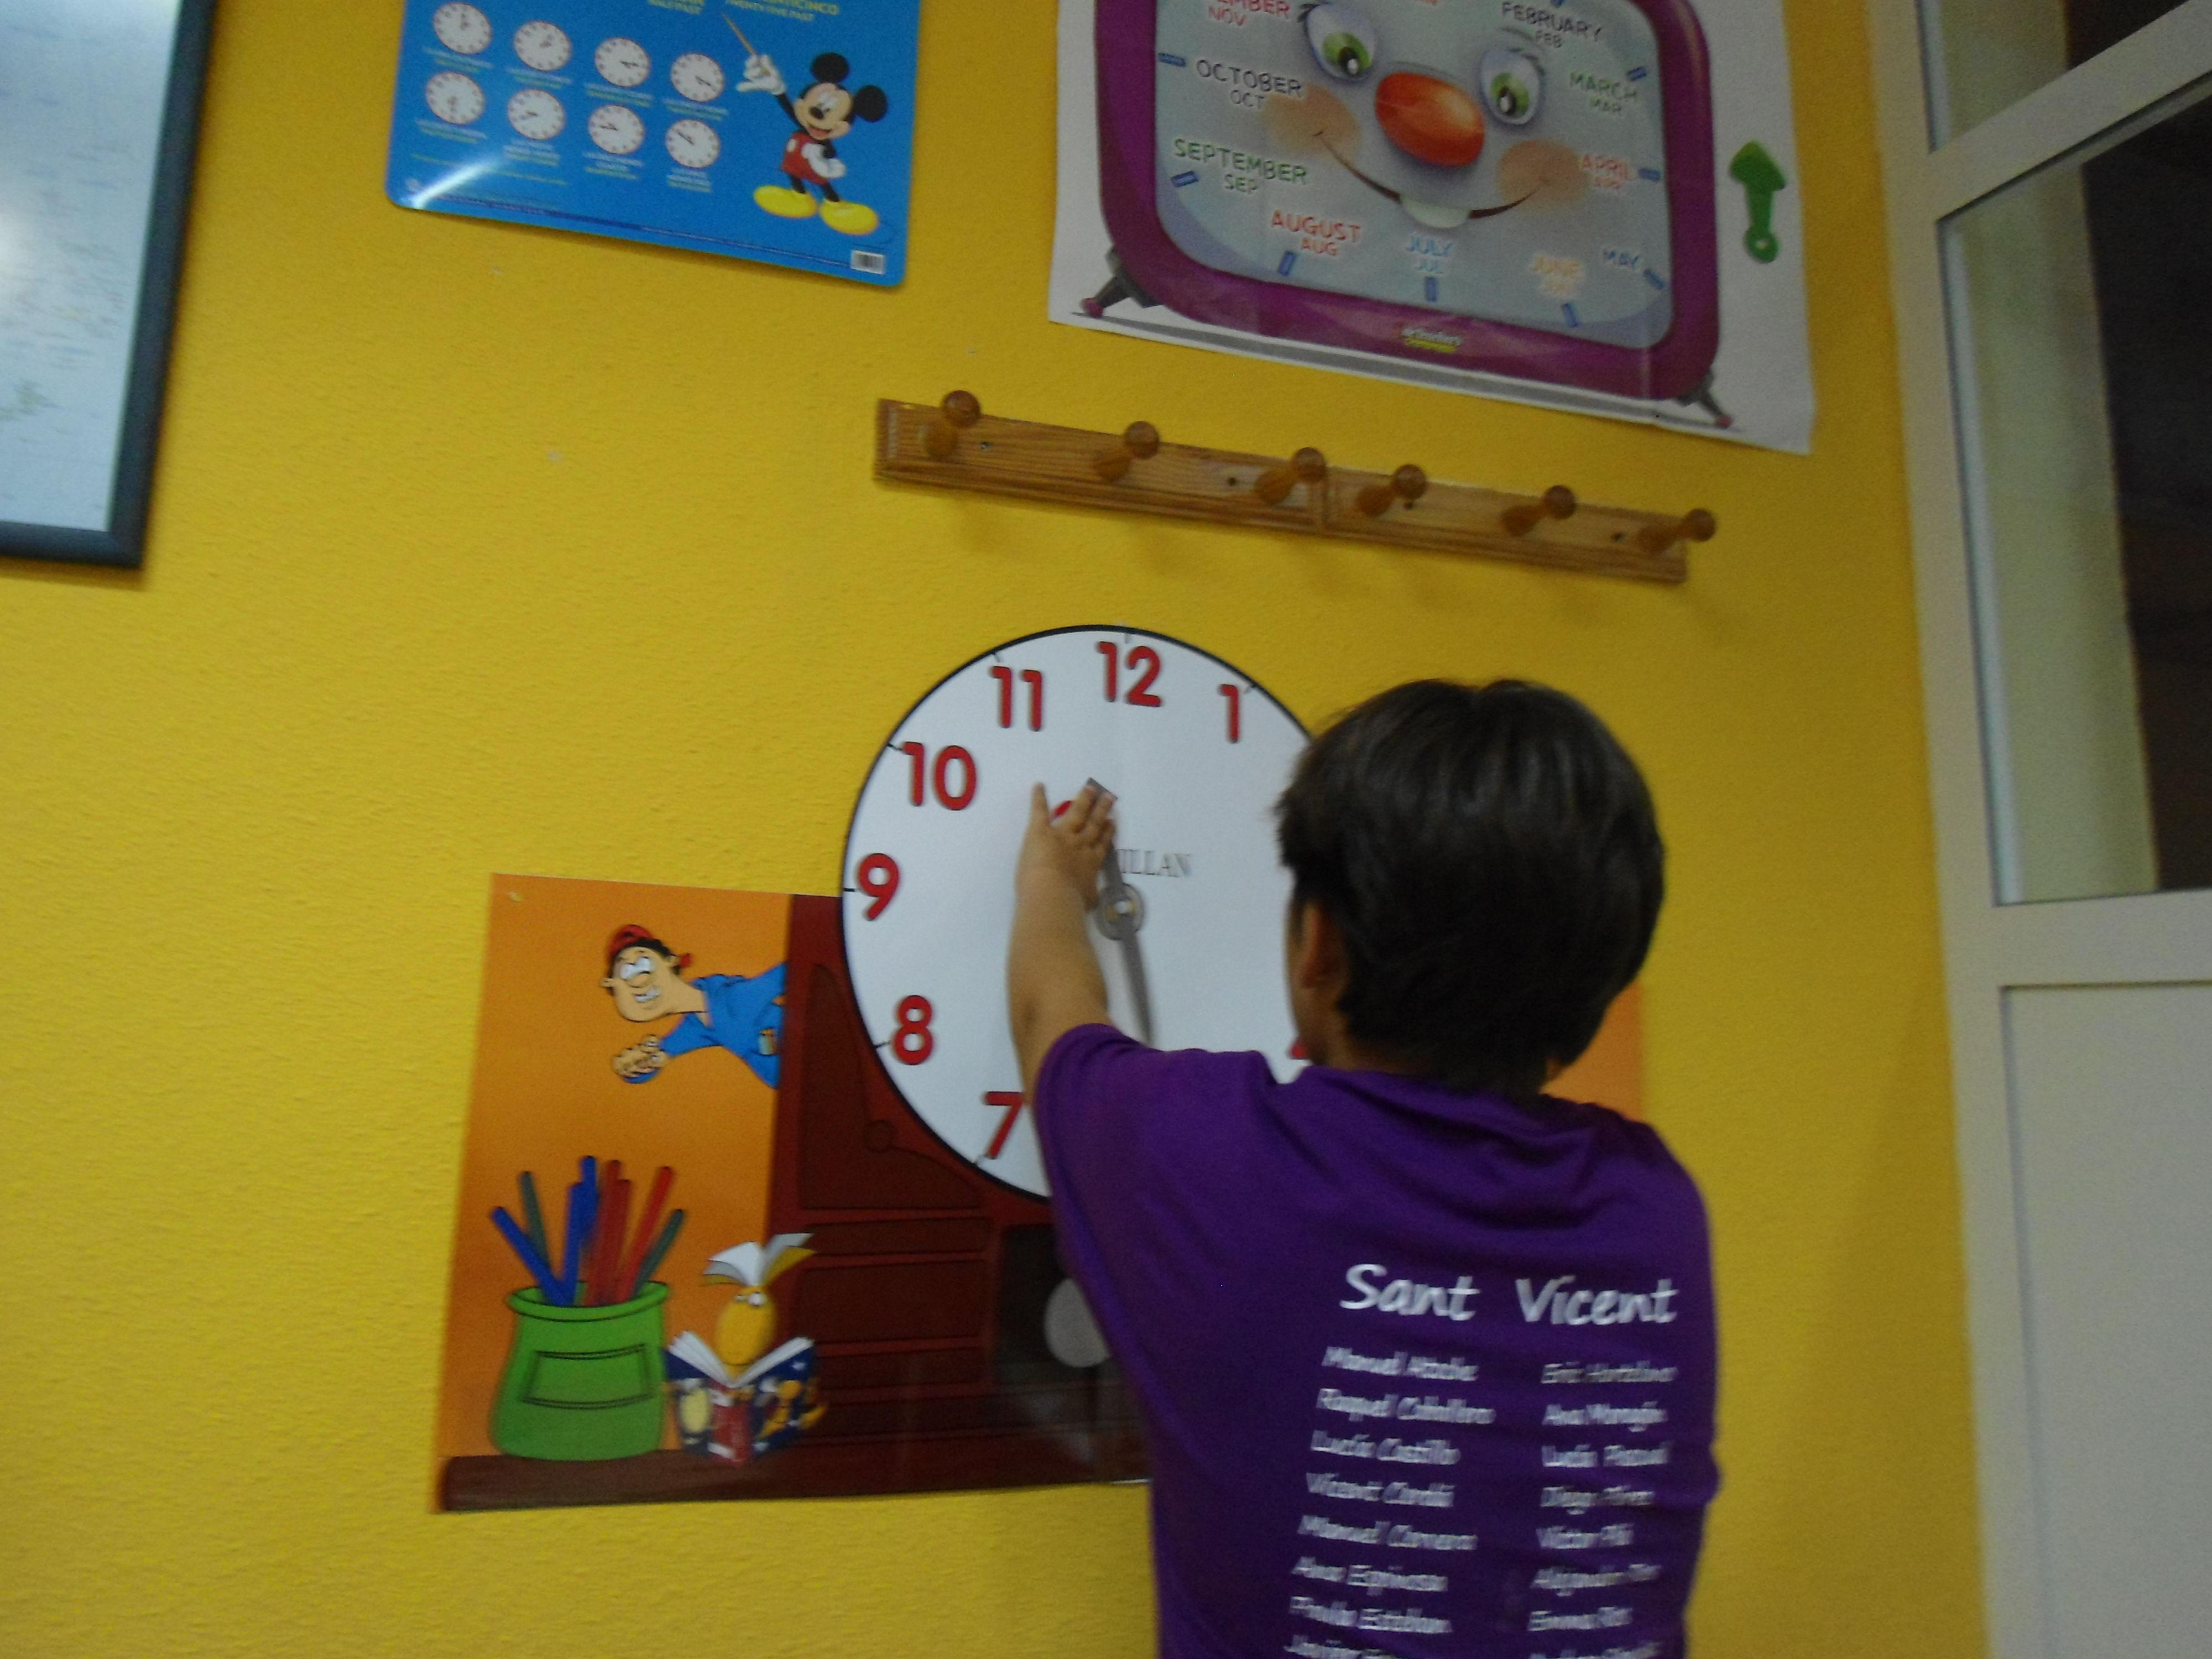 Foto 25 de Academias de idiomas en Moncada | Centre d'Estudis Etnies